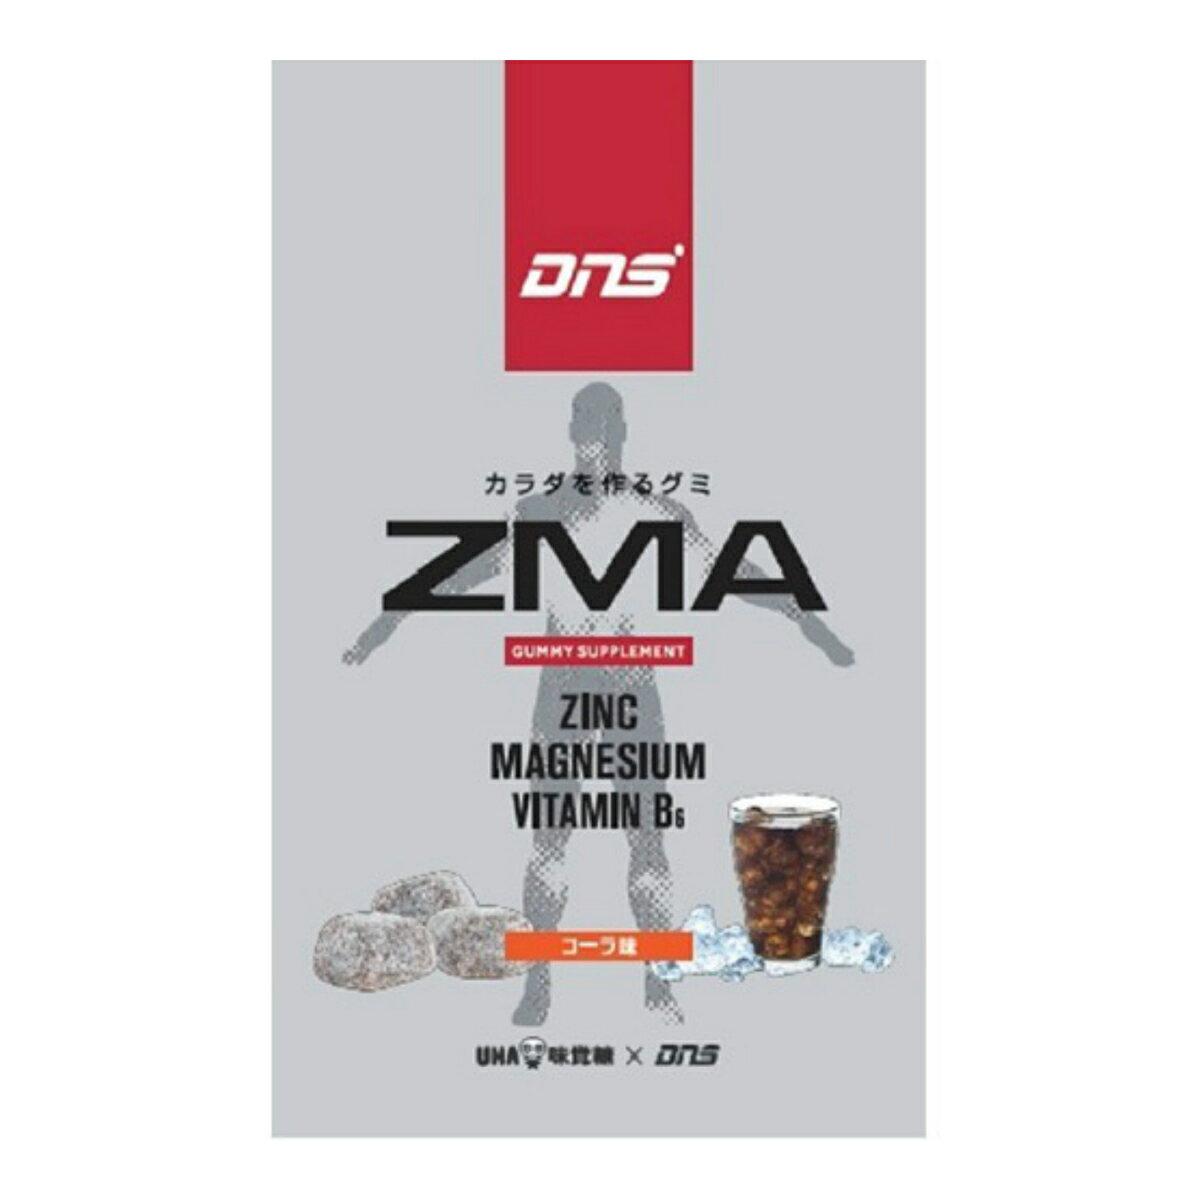 UHA味覚糖 DNSグミ ZMA 29g